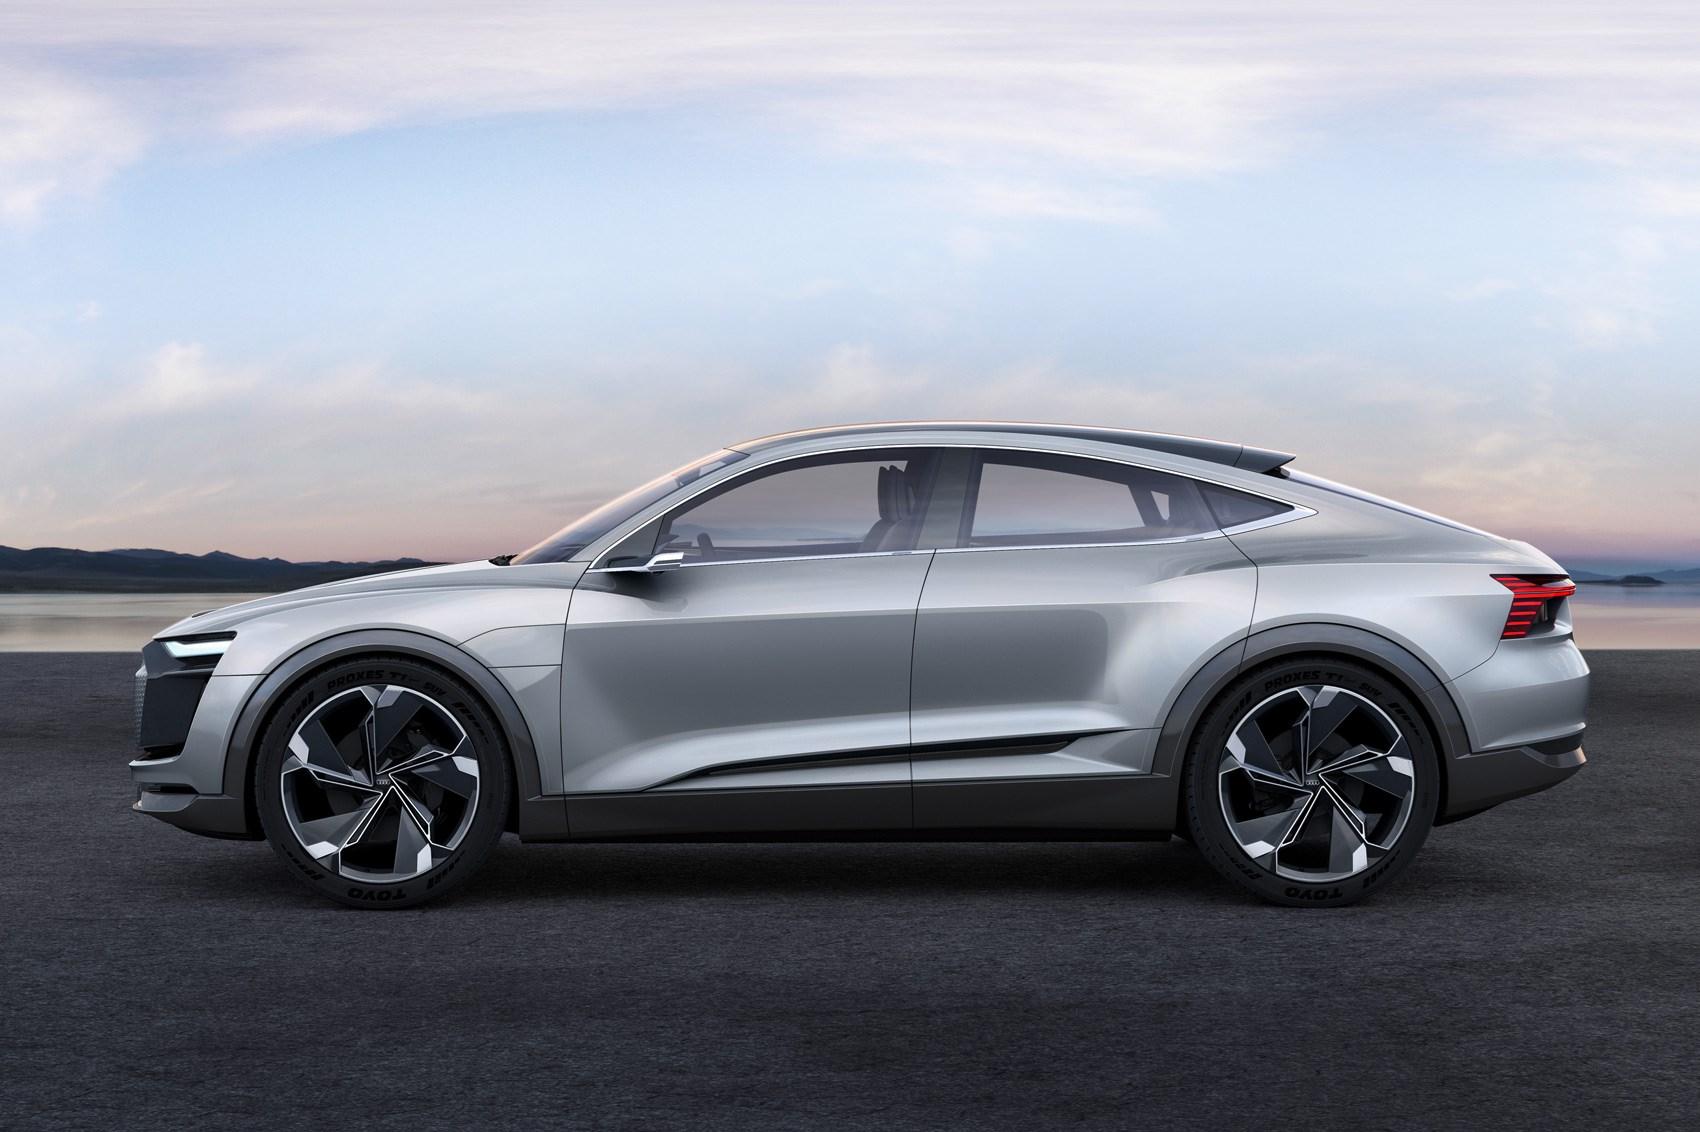 Unveiled In Shanghai The New Audi E Tron Sportback Concept Car